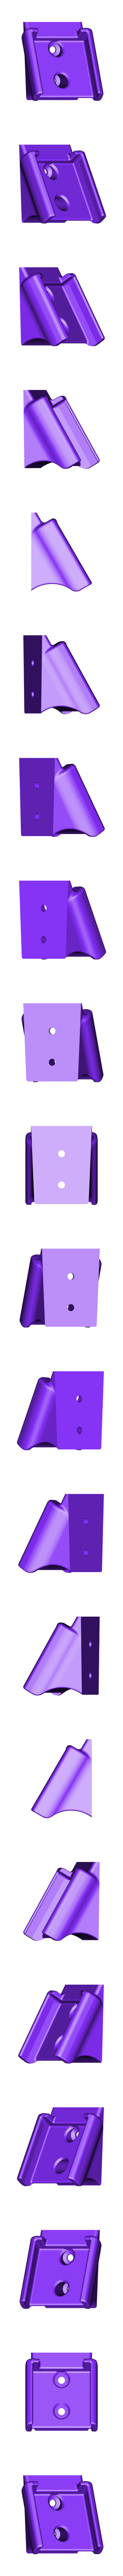 Sd card adapter extender.stl Download STL file SD-card extender holder • 3D printer template, victor_designs